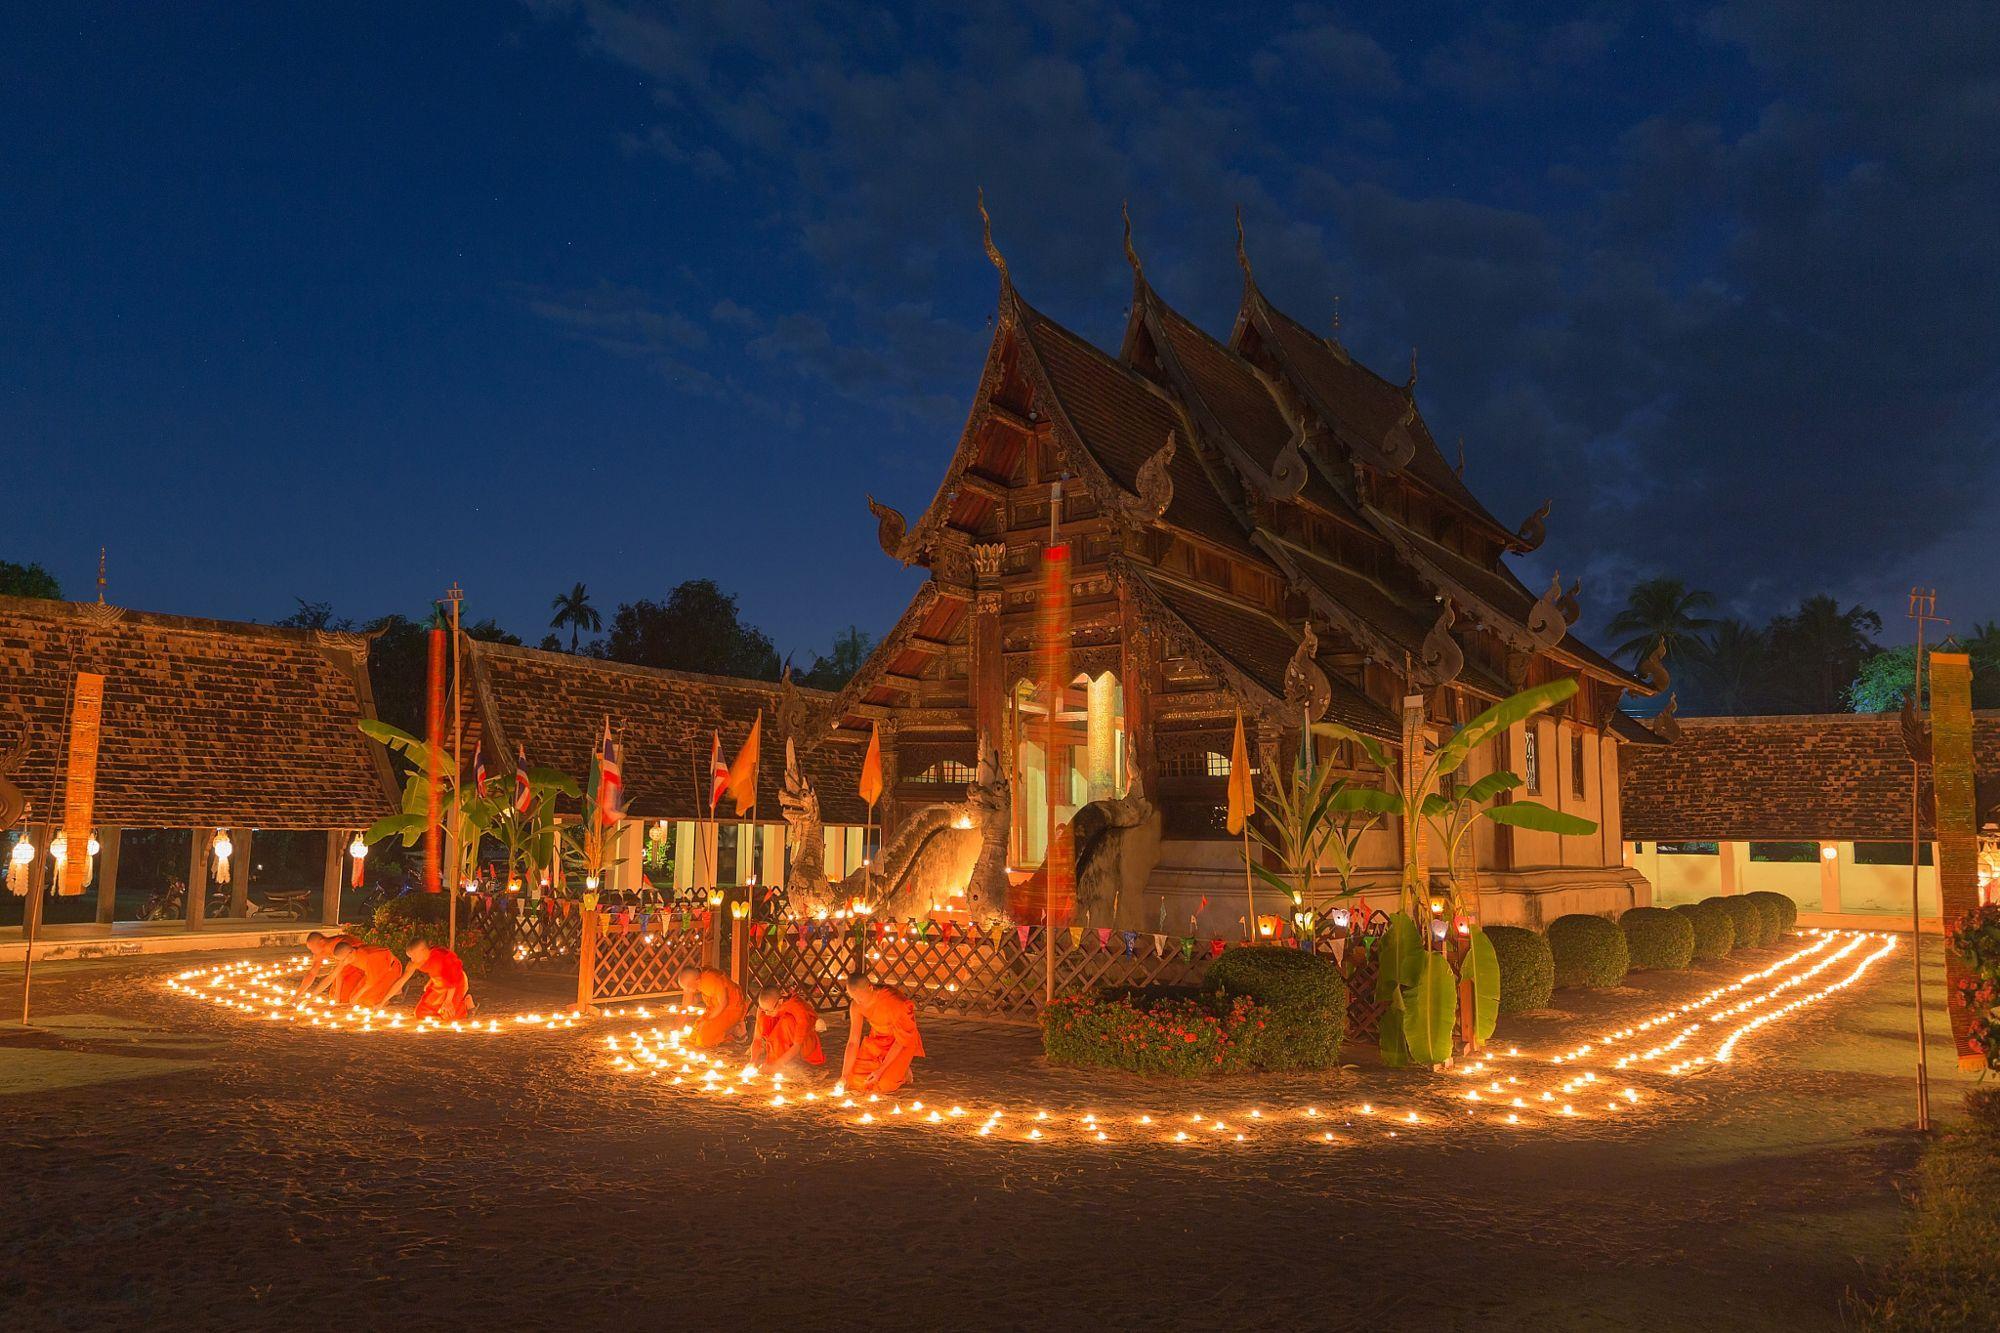 Yi Peng Festival at Wat Ton Kwen, Chiang Mai, Thailand by ANUJAK JAIMOOK on 500px